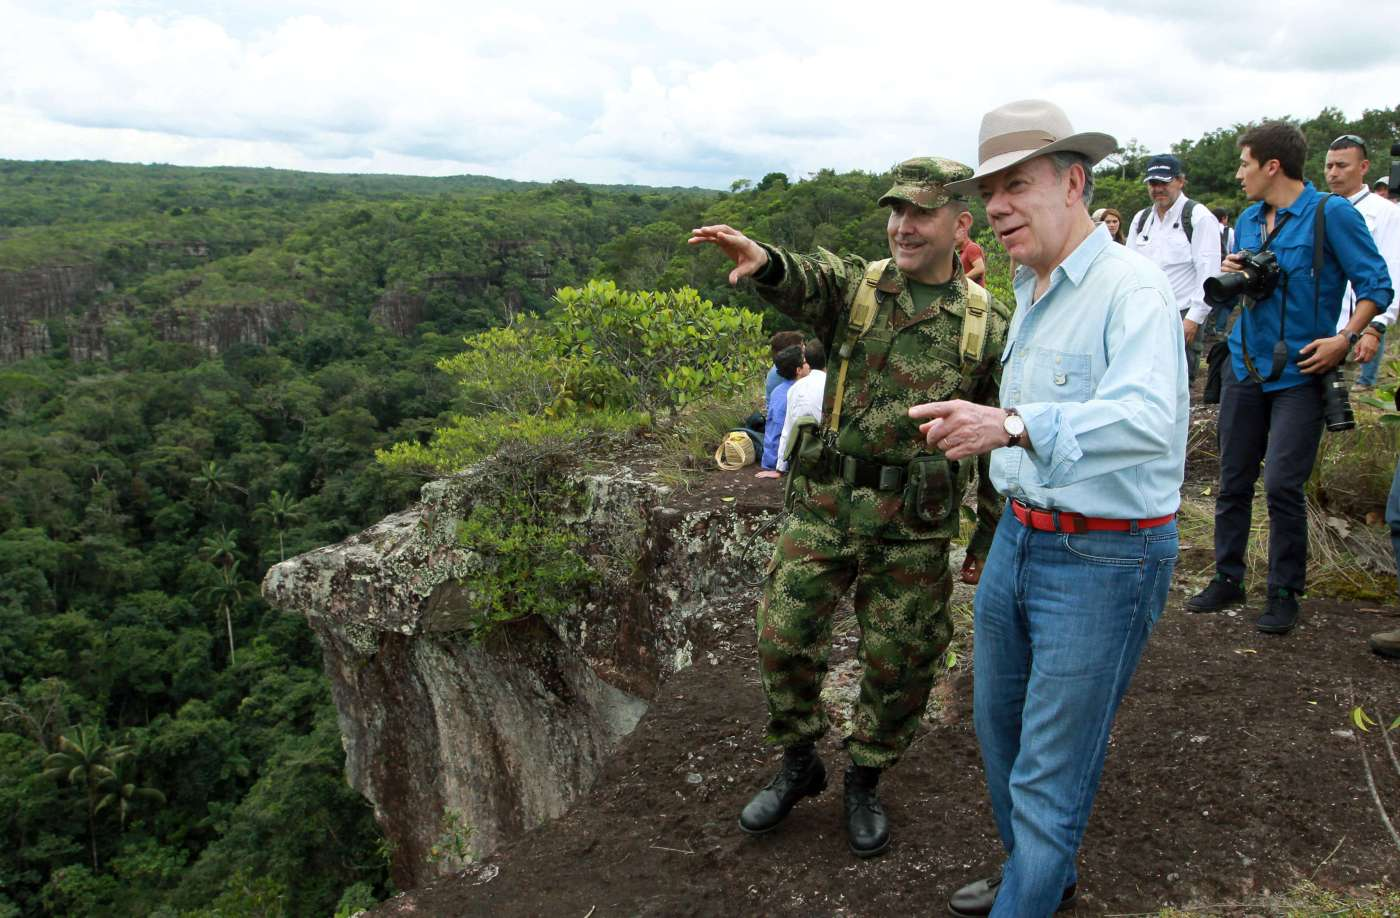 Juan Manuel Santos recorre el Parque Natural de Chiribiquete